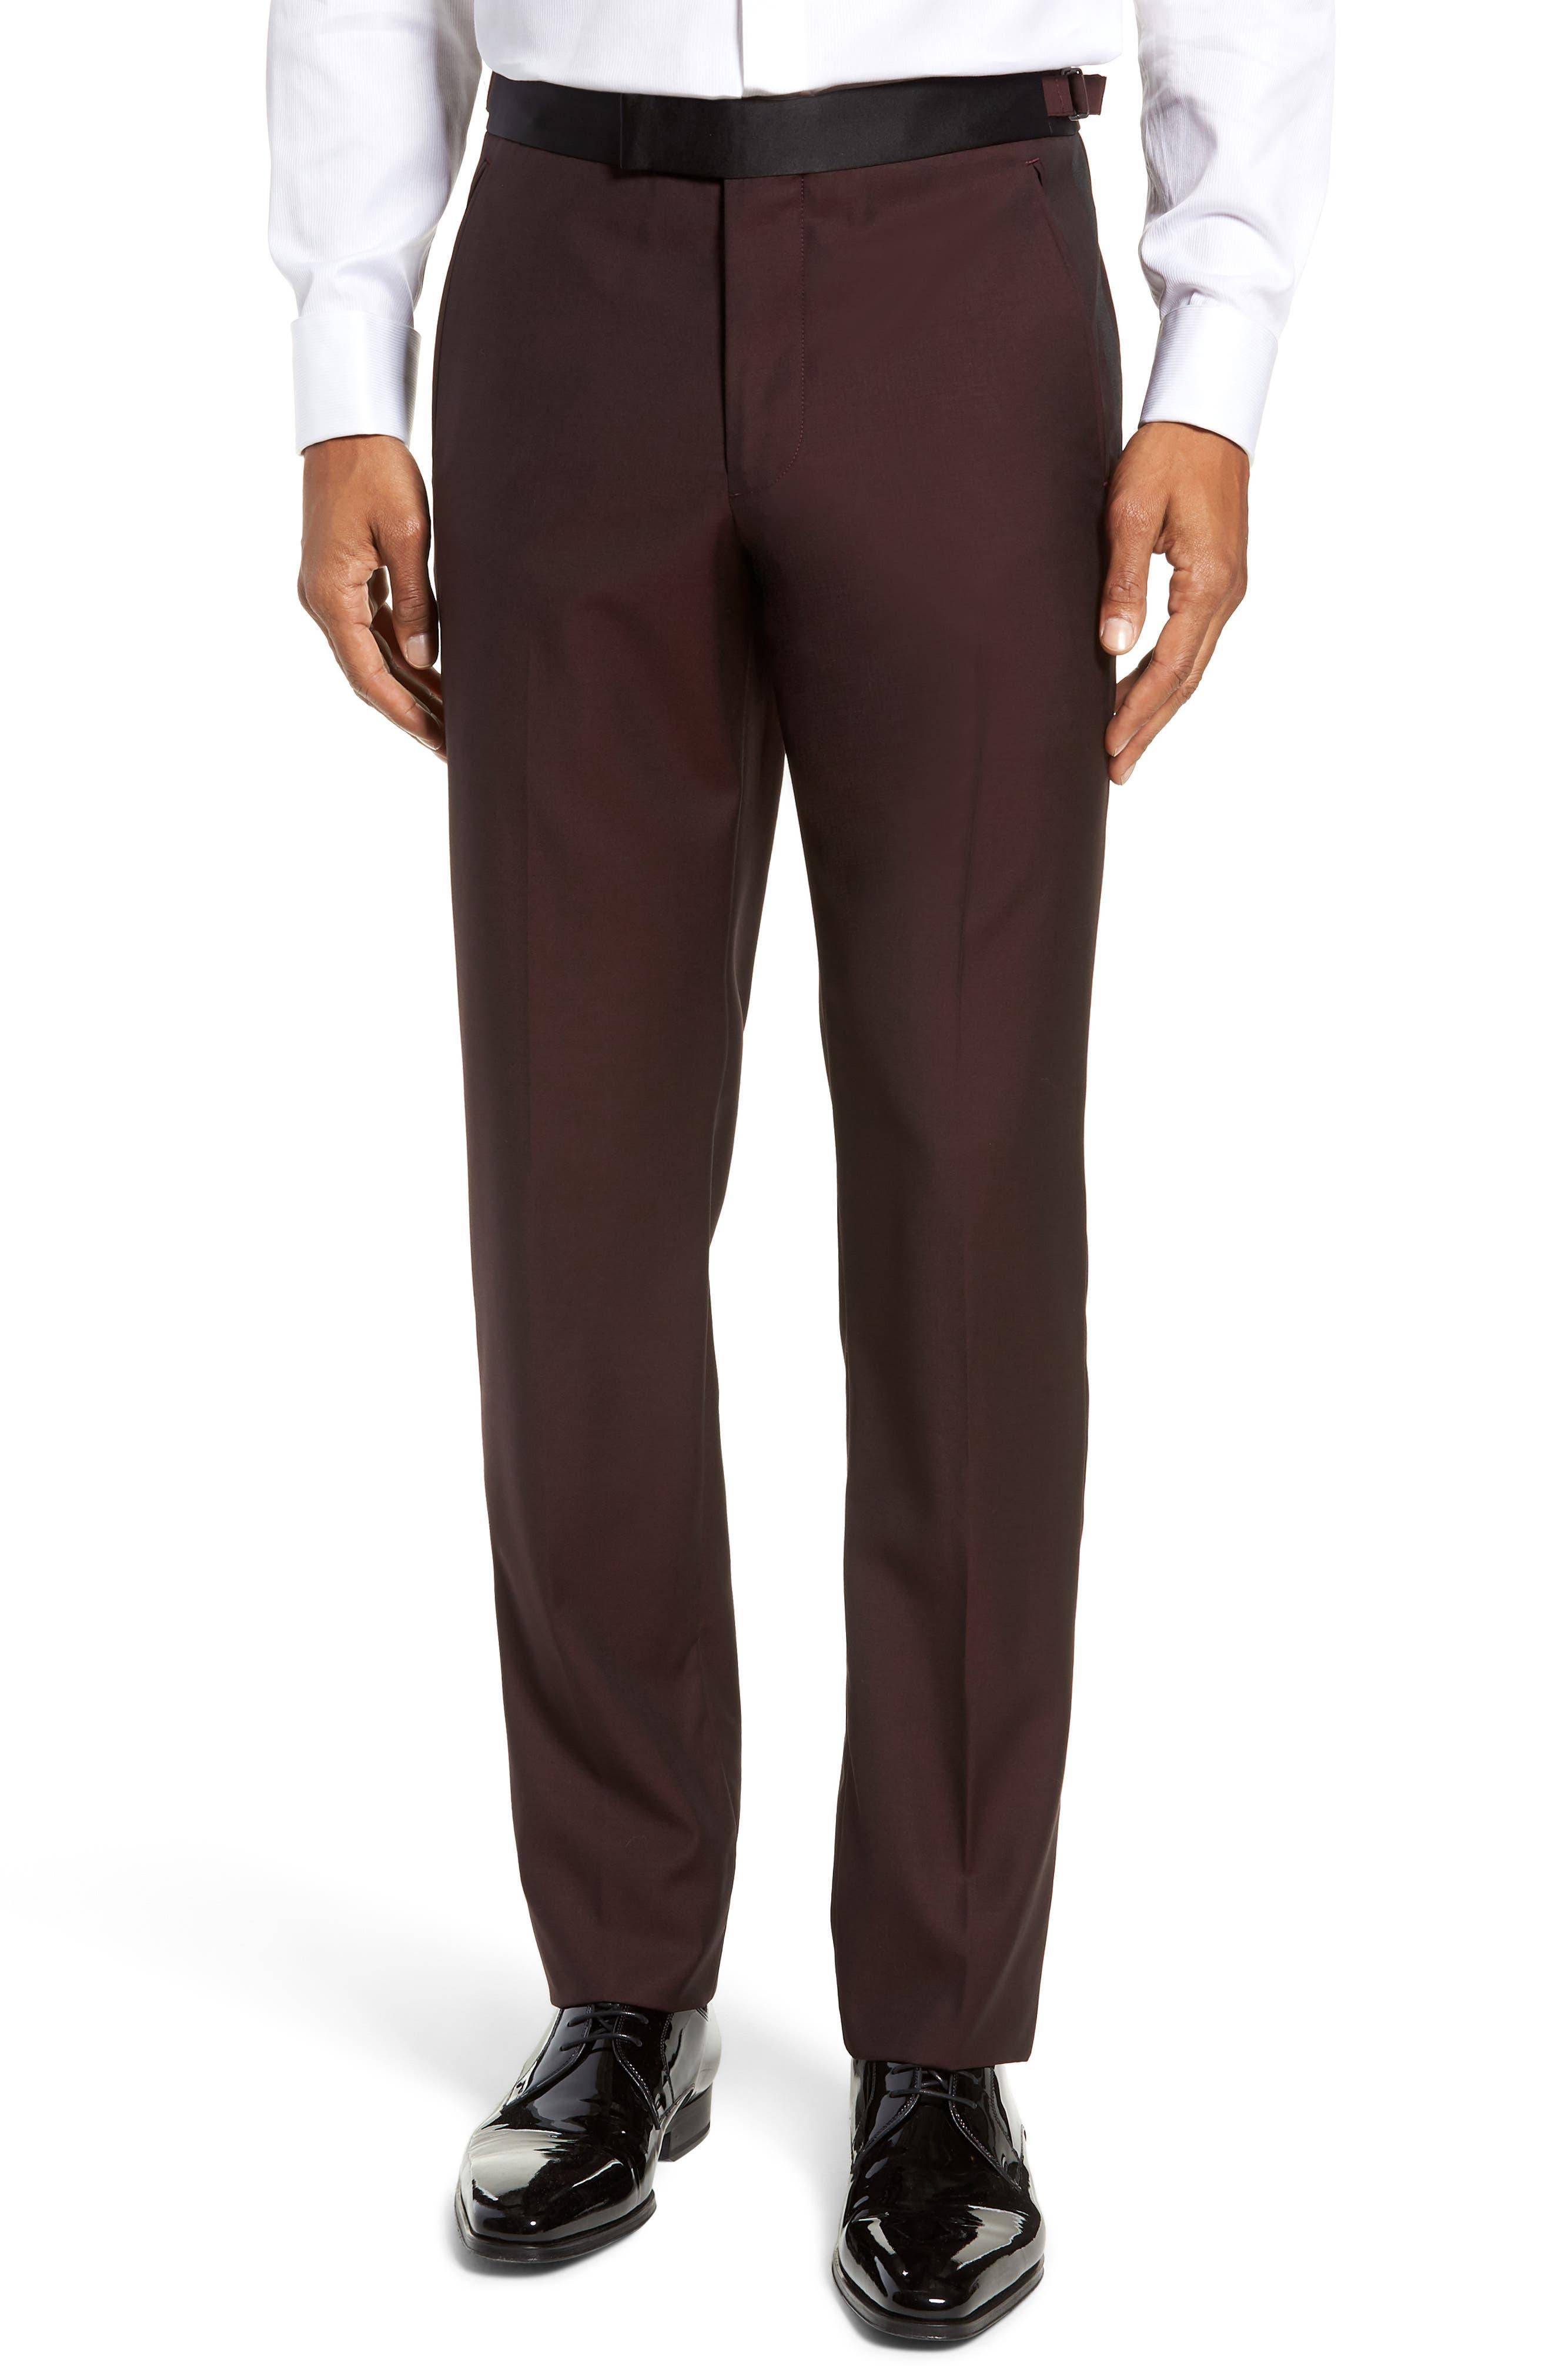 Capstone Slim Fit Tuxedo Trousers,                         Main,                         color, MAROON